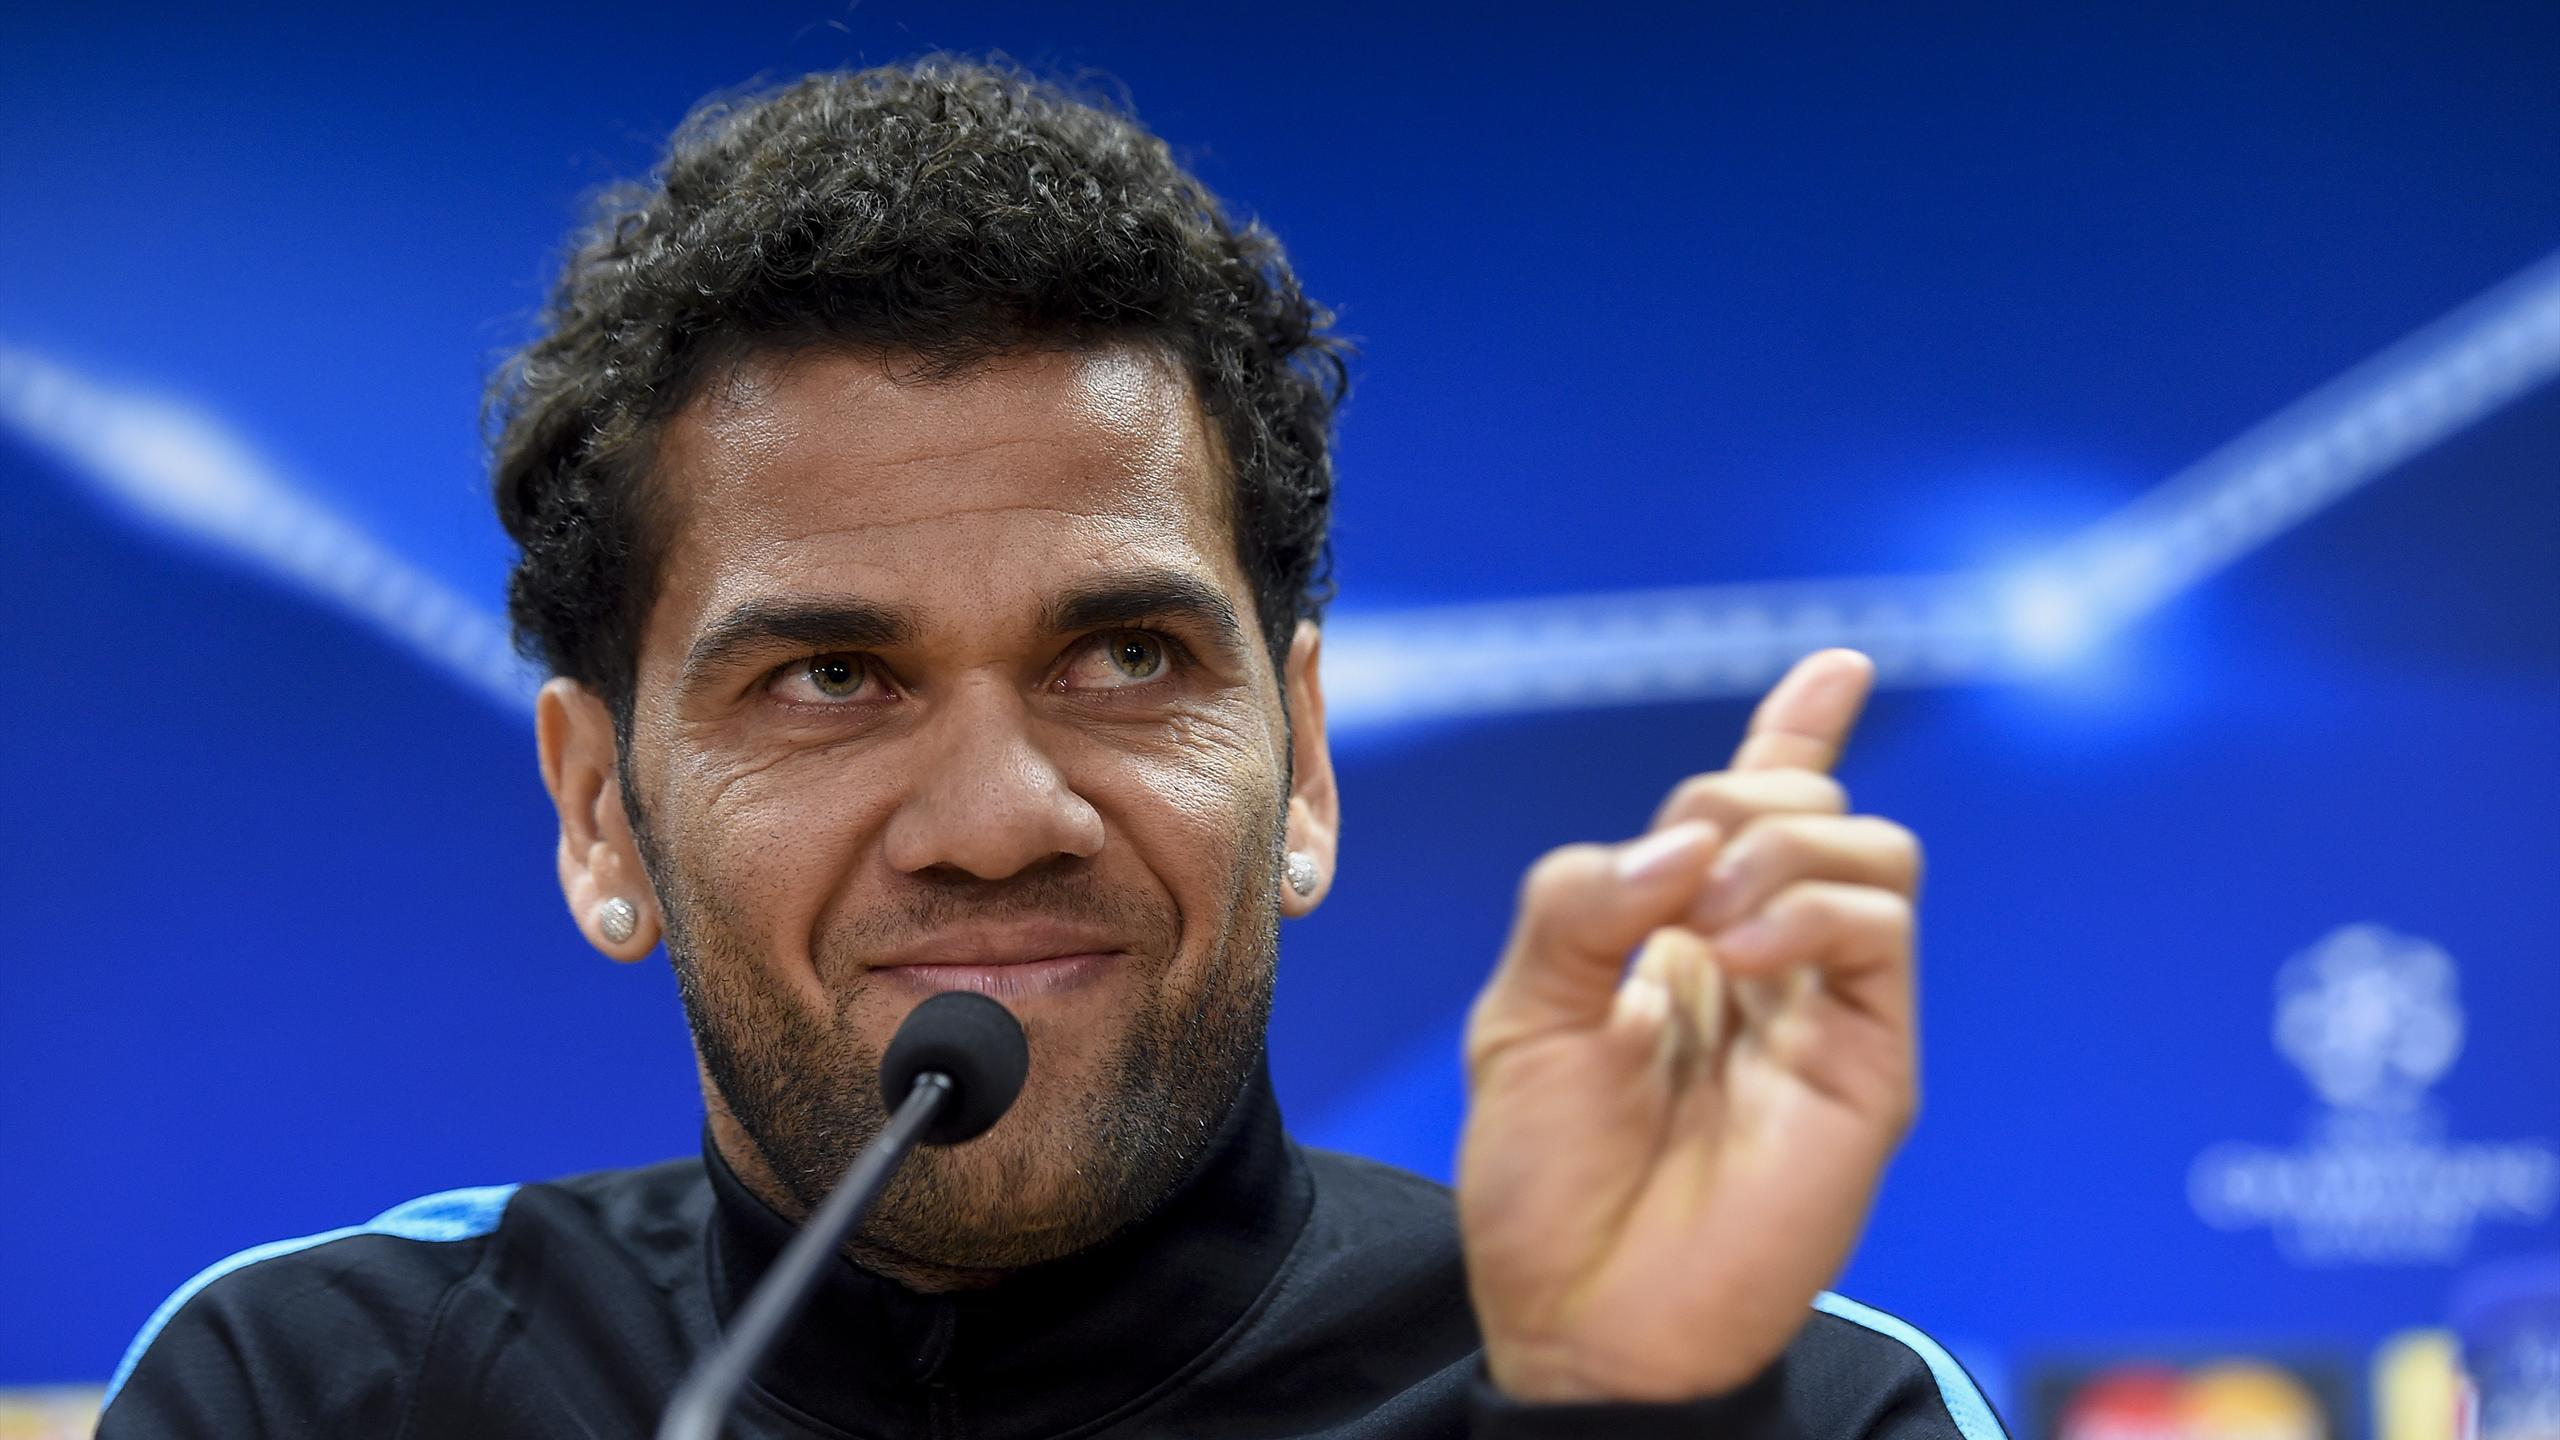 Barcelona's Brazilian defender Dani Alves gestures as he answers journalists